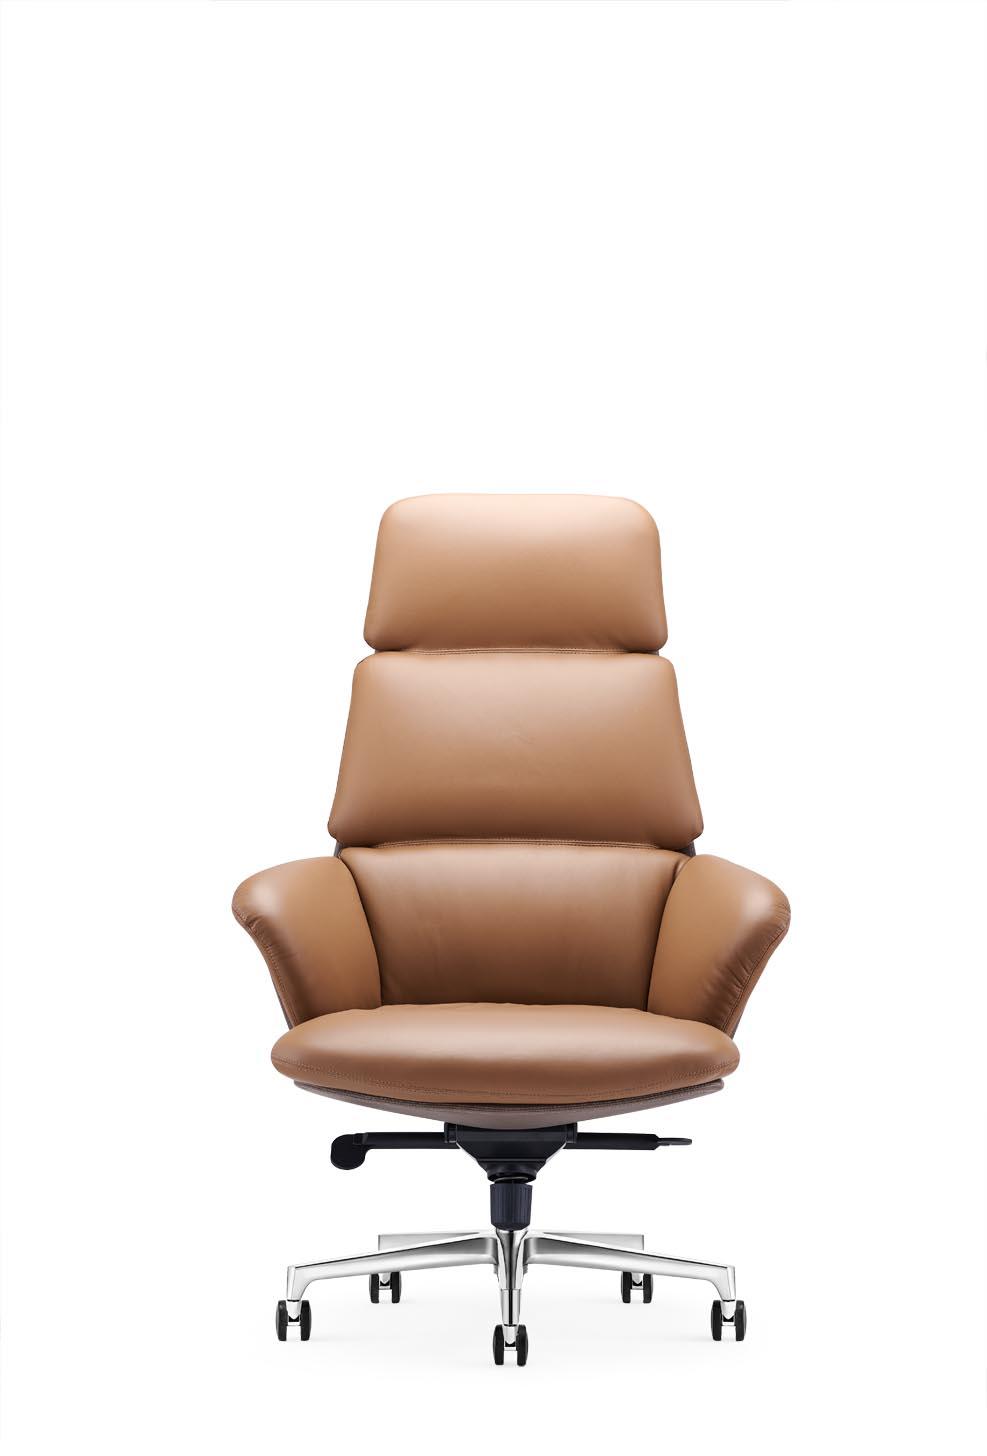 HY-4012經理椅